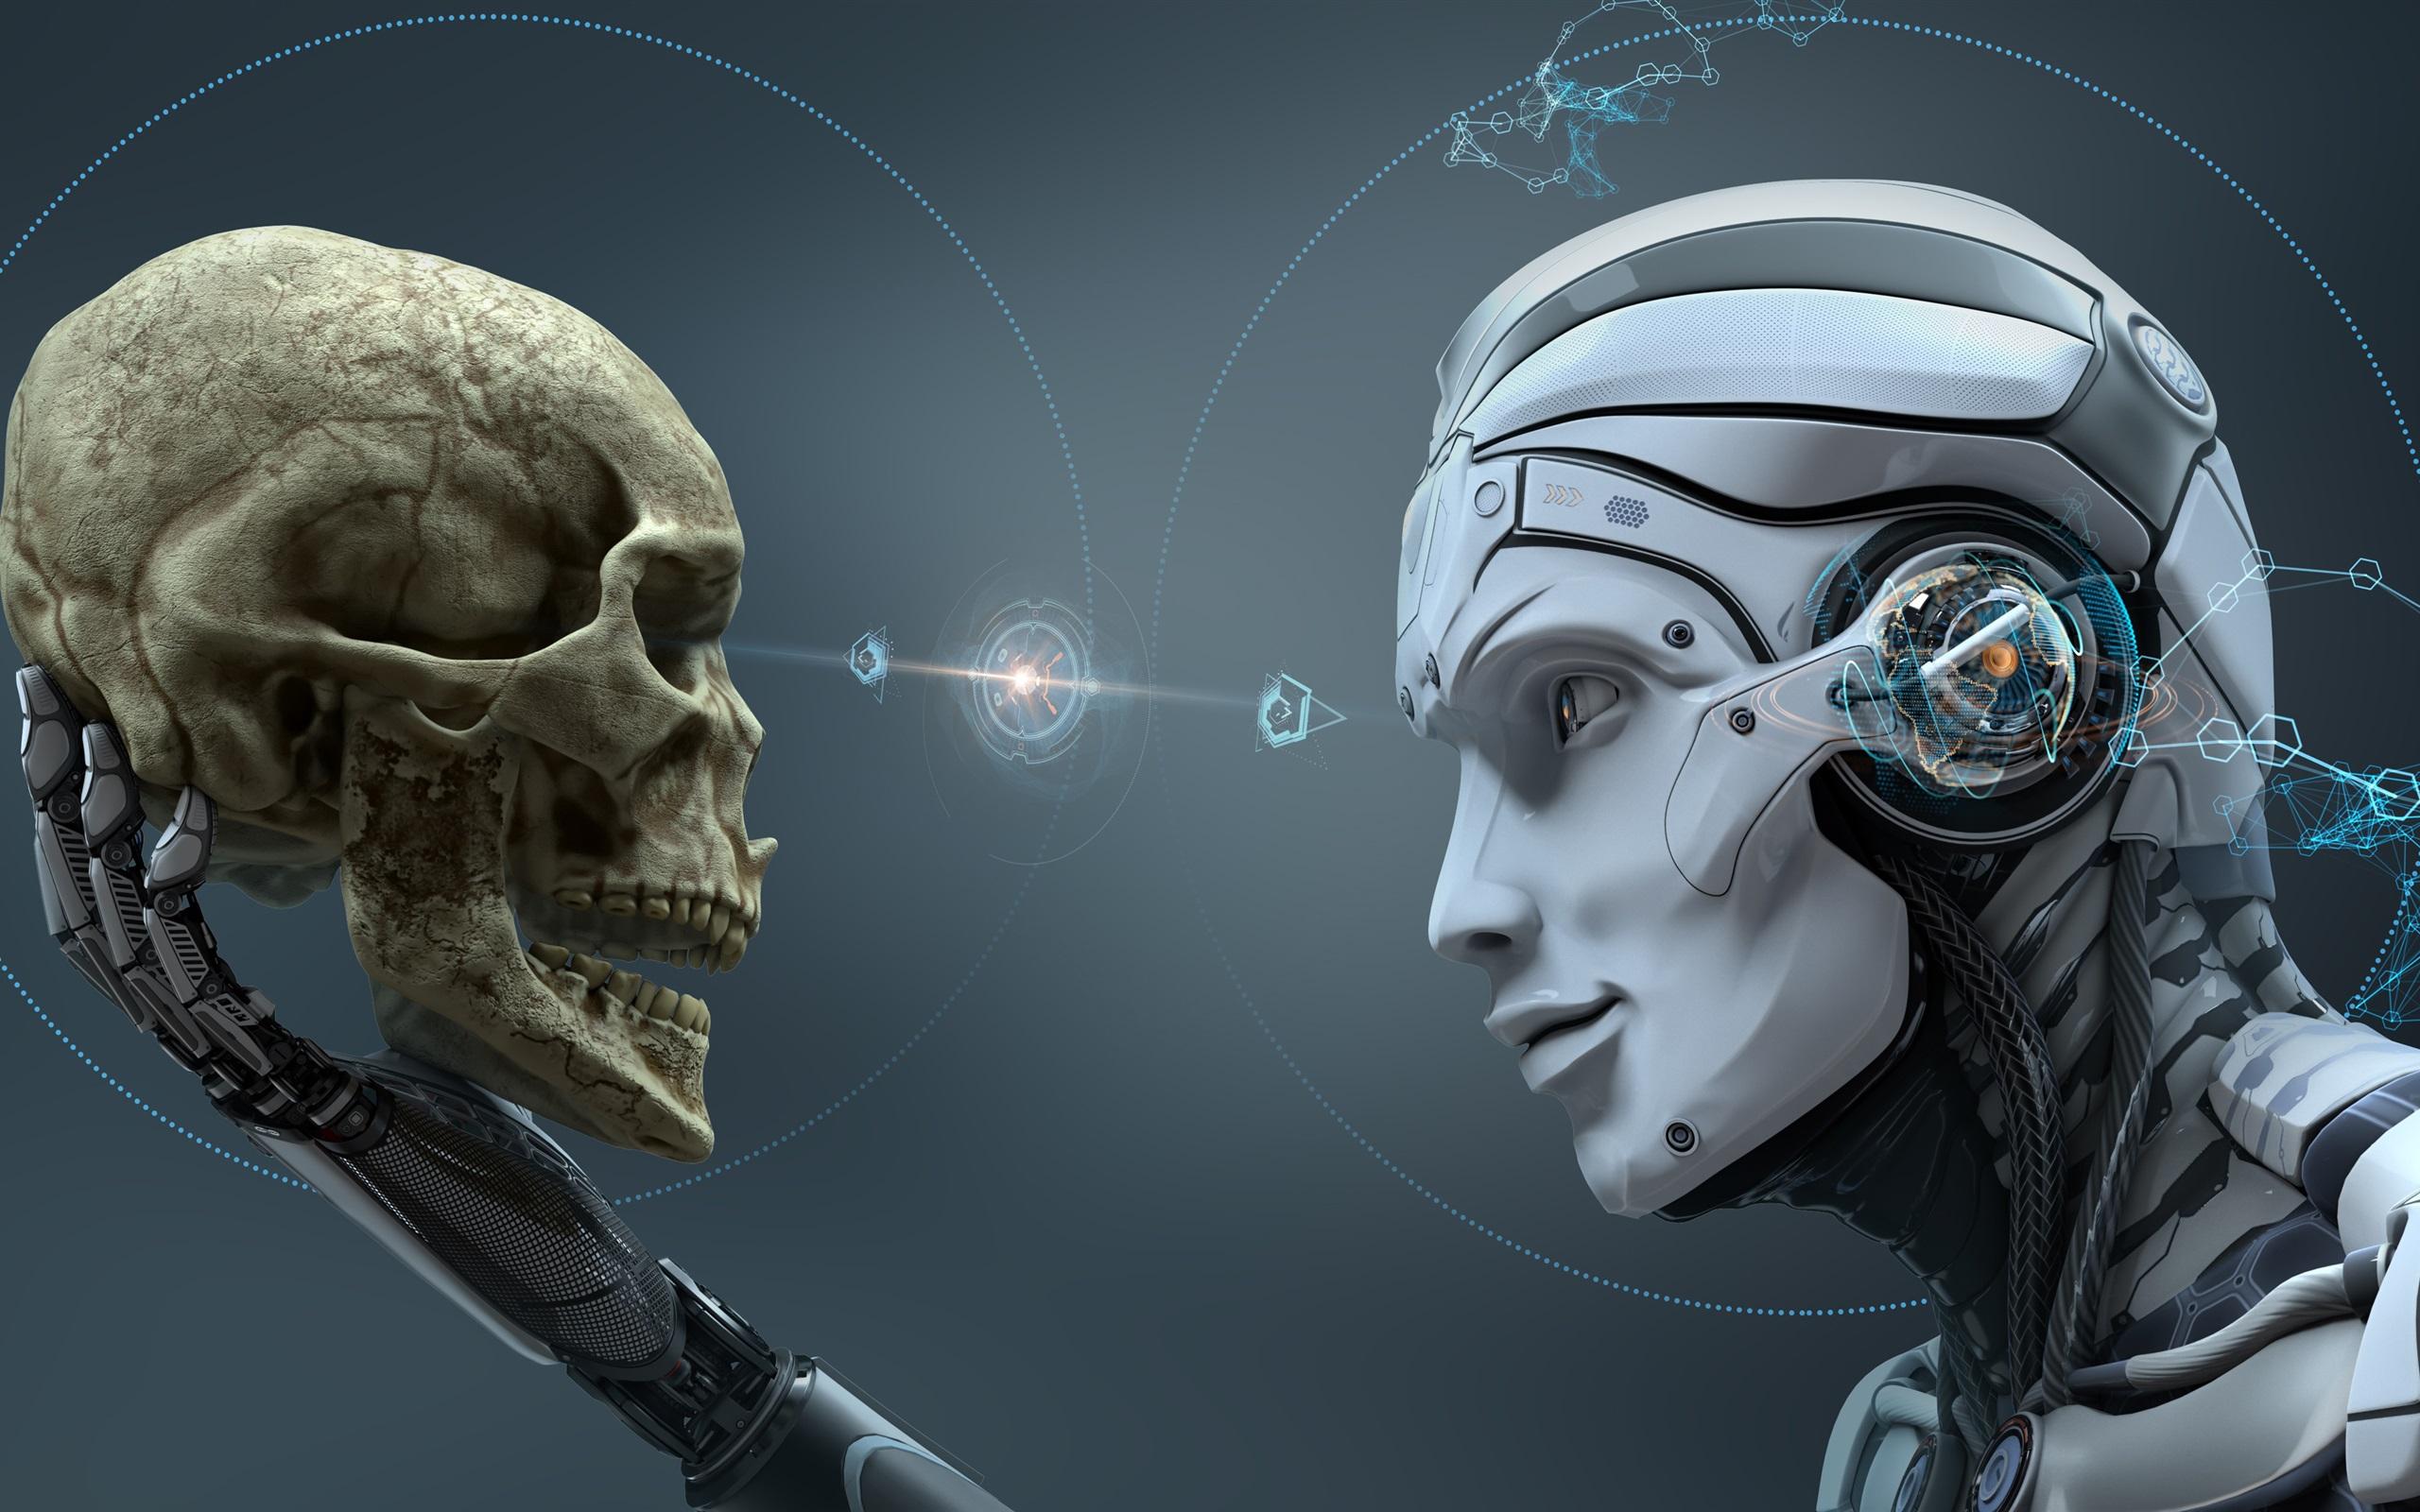 Wallpaper Robot Skull Creative Design 3840x2160 Uhd 4k